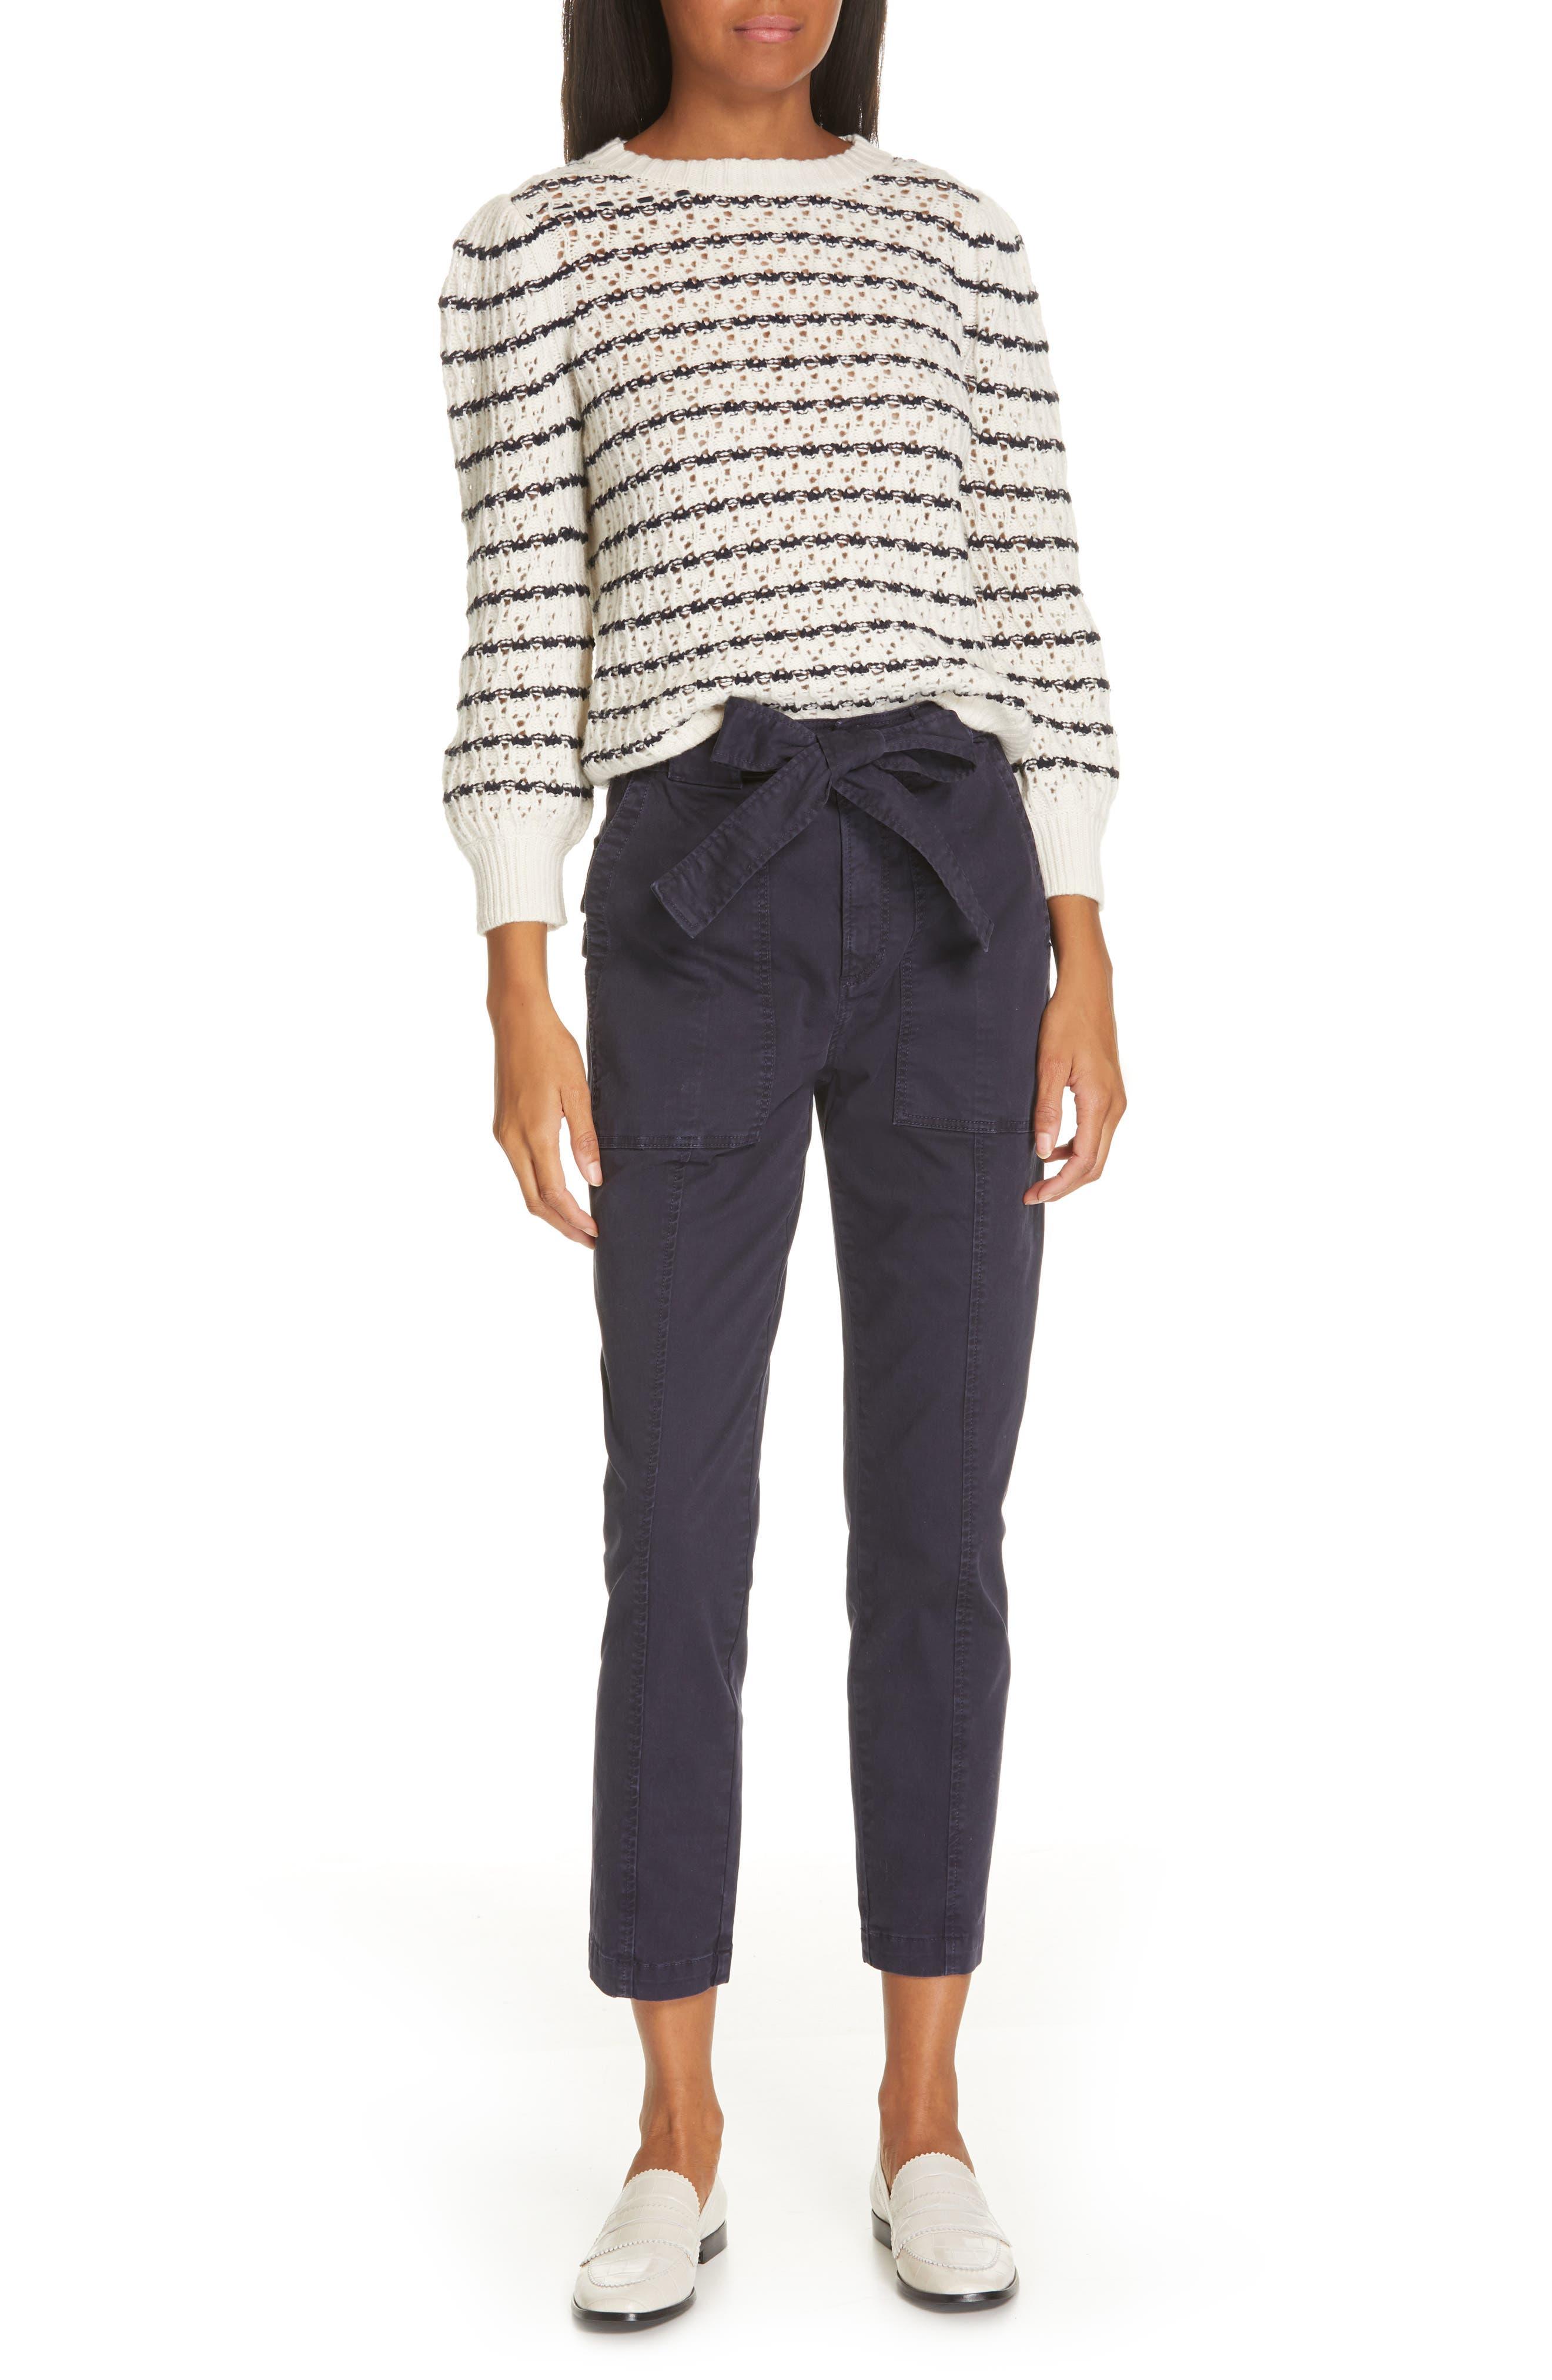 LA VIE REBECCA TAYLOR,                             Stripe Pointelle Sweater,                             Alternate thumbnail 7, color,                             ECRU/ MIDNIGHT NAVY